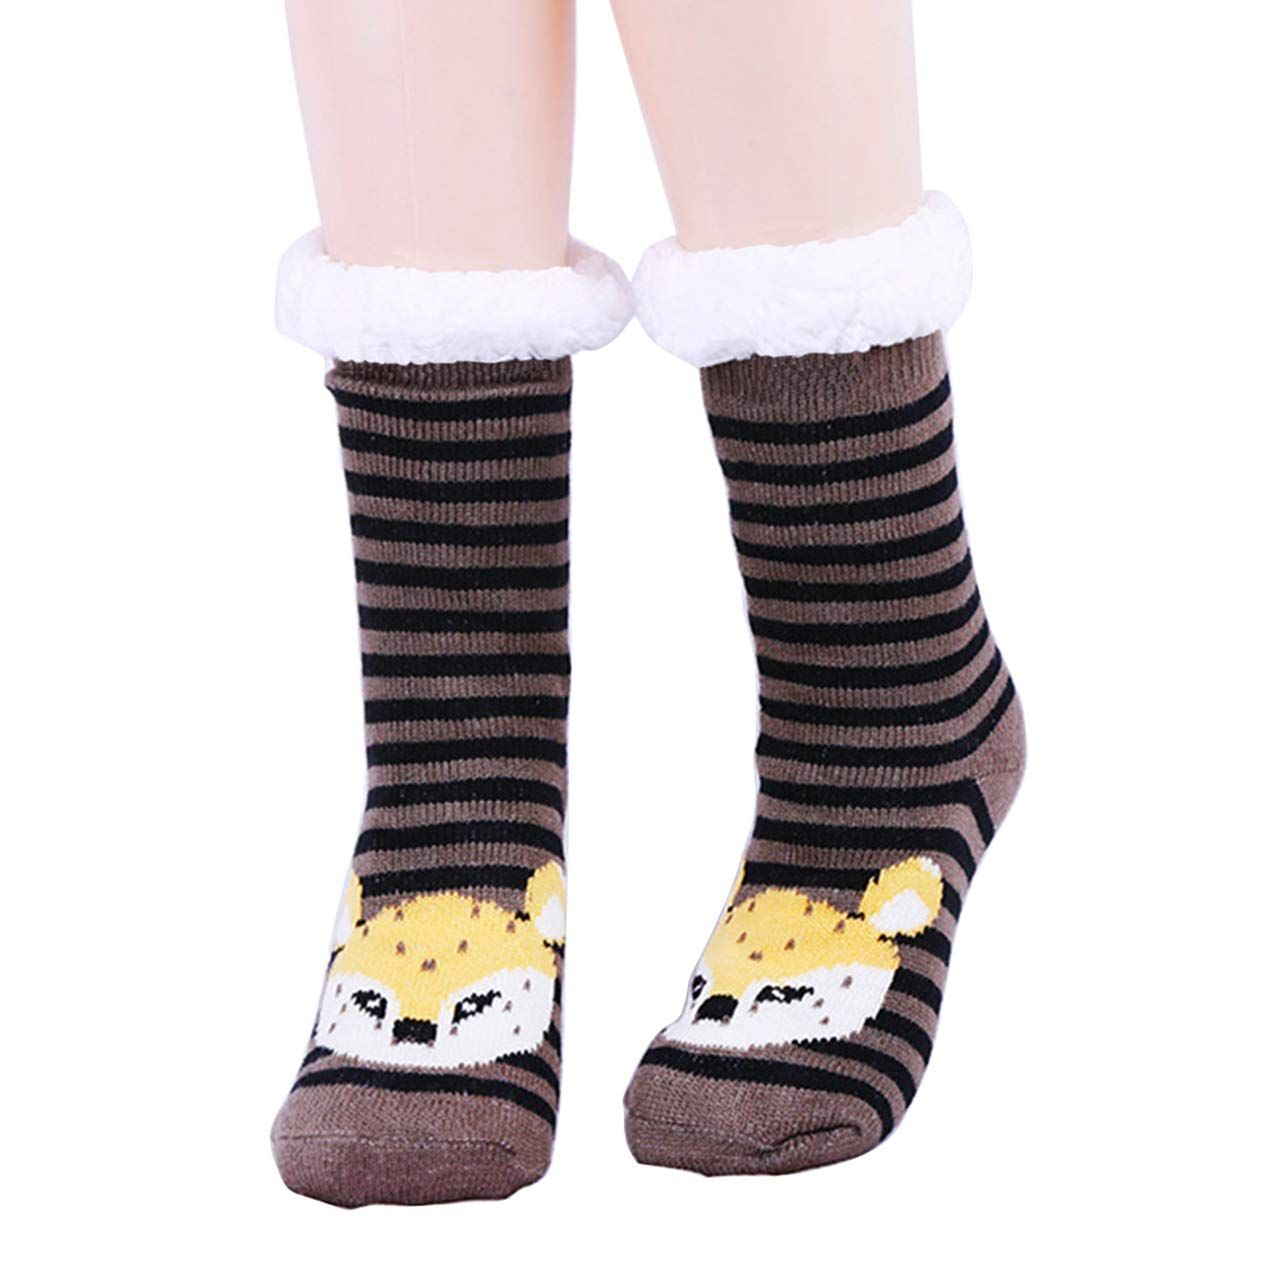 Fuzzy Winter Socks For Women Super Soft Foot Wears Christmas Warm Non-slip Sock